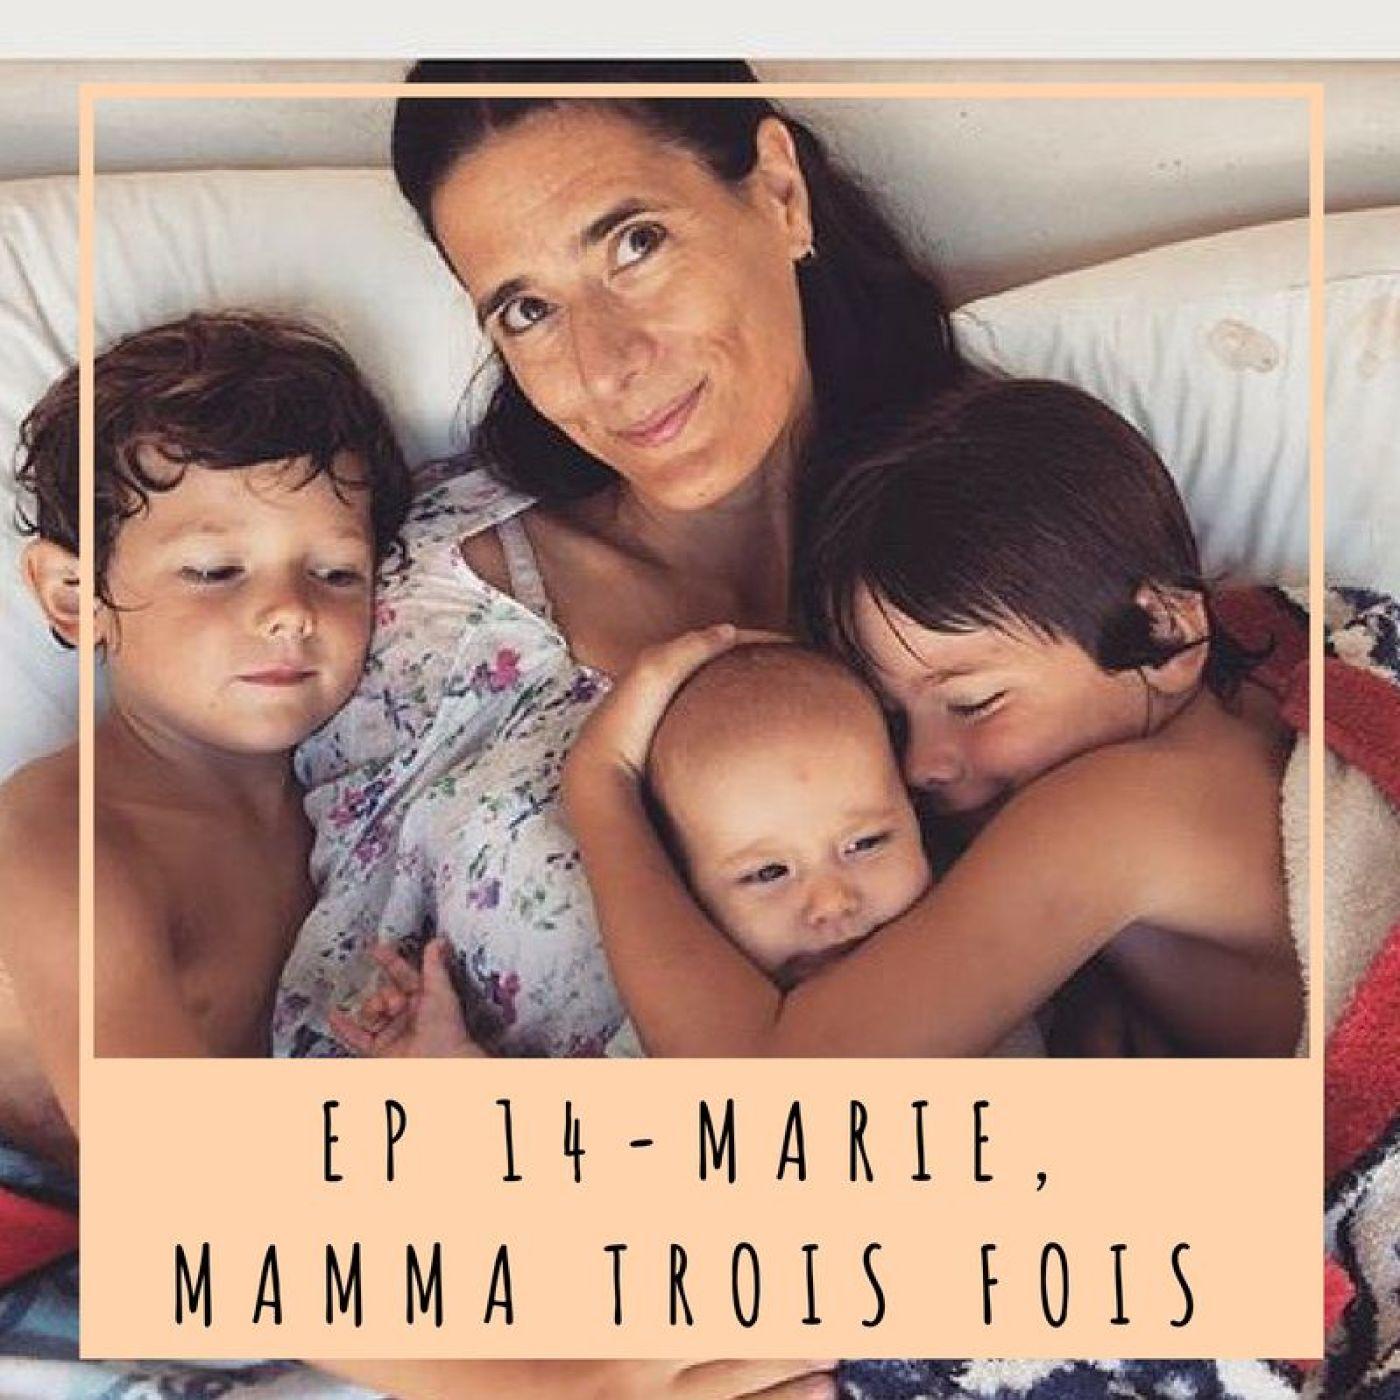 EP 14- MARIE, MAMMA TROIS FOIS